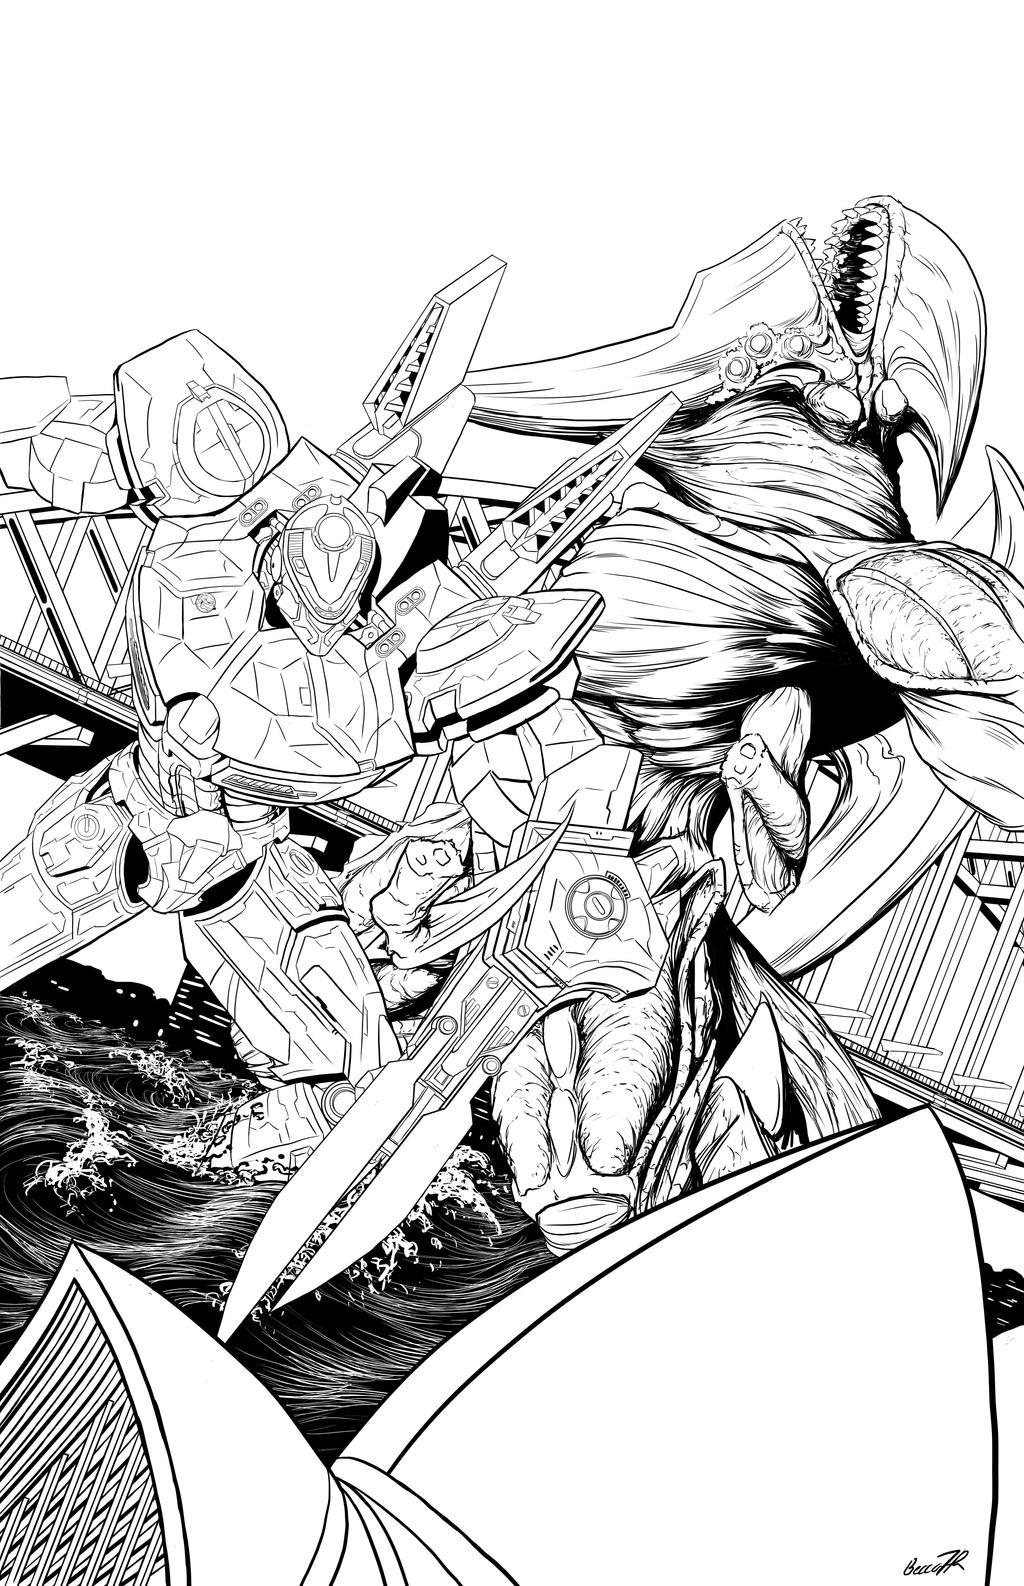 Striker Eureka vs. Mutavore Inks by ShamanMagic